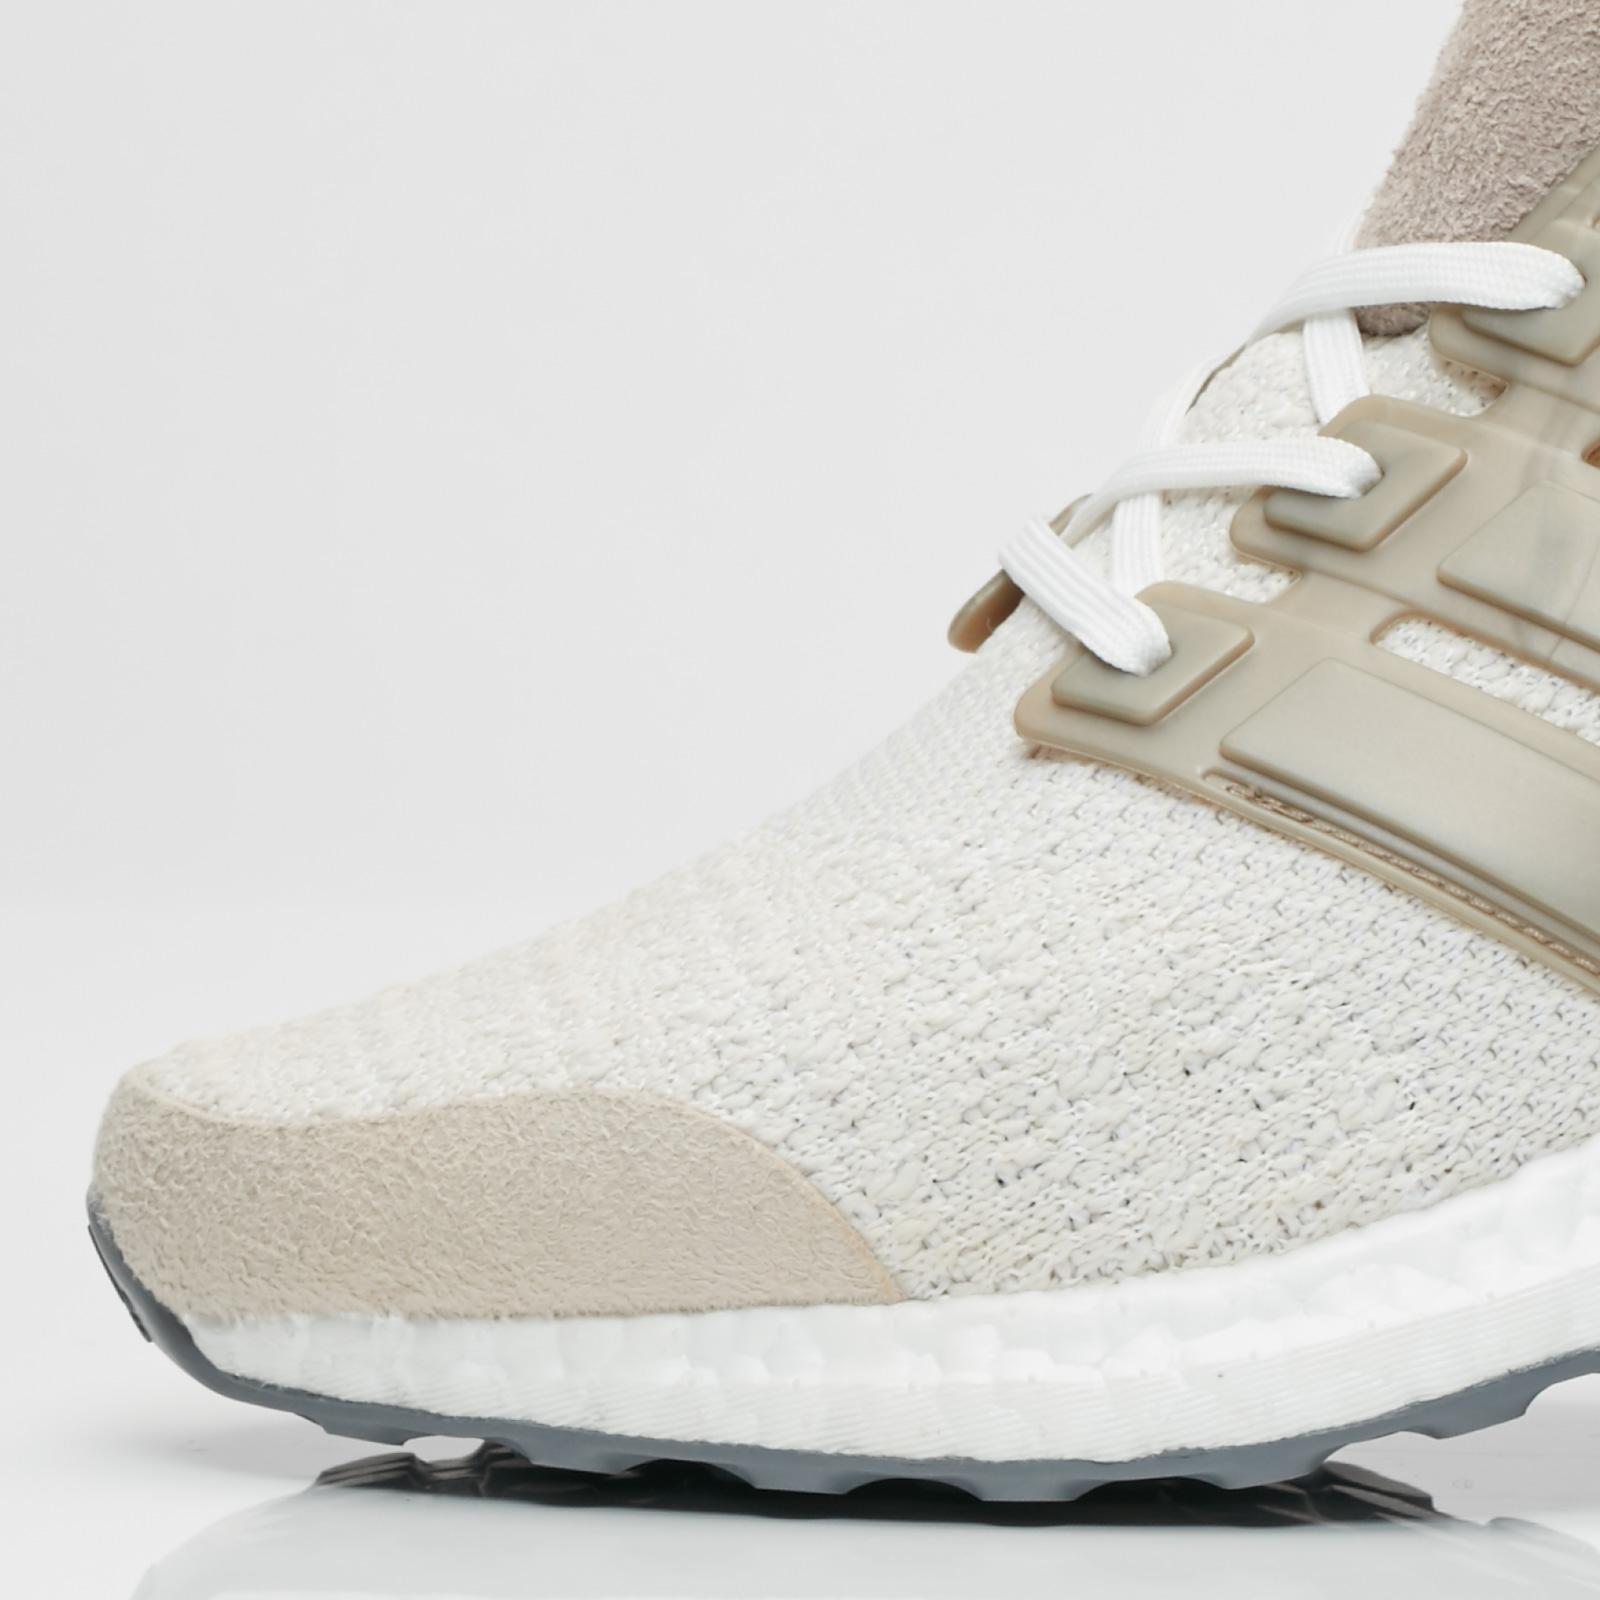 adidas UltraBOOST Lux - Db0338 - Sneakersnstuff  7e84ecd14cab